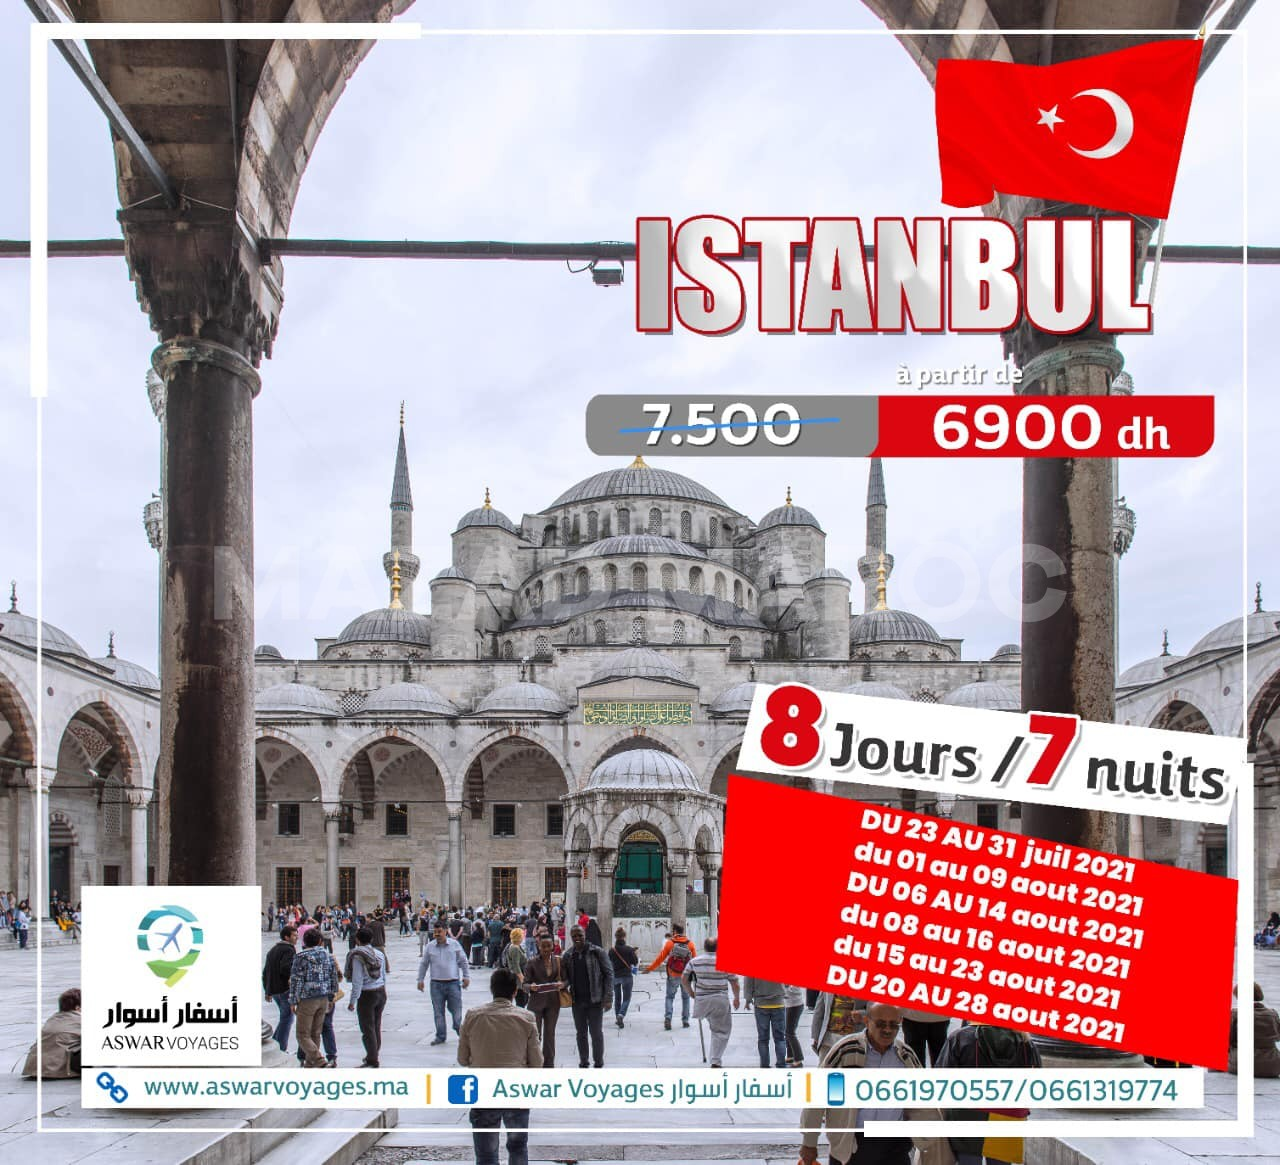 Voyage organisé en turky   avec Aswar Voyages